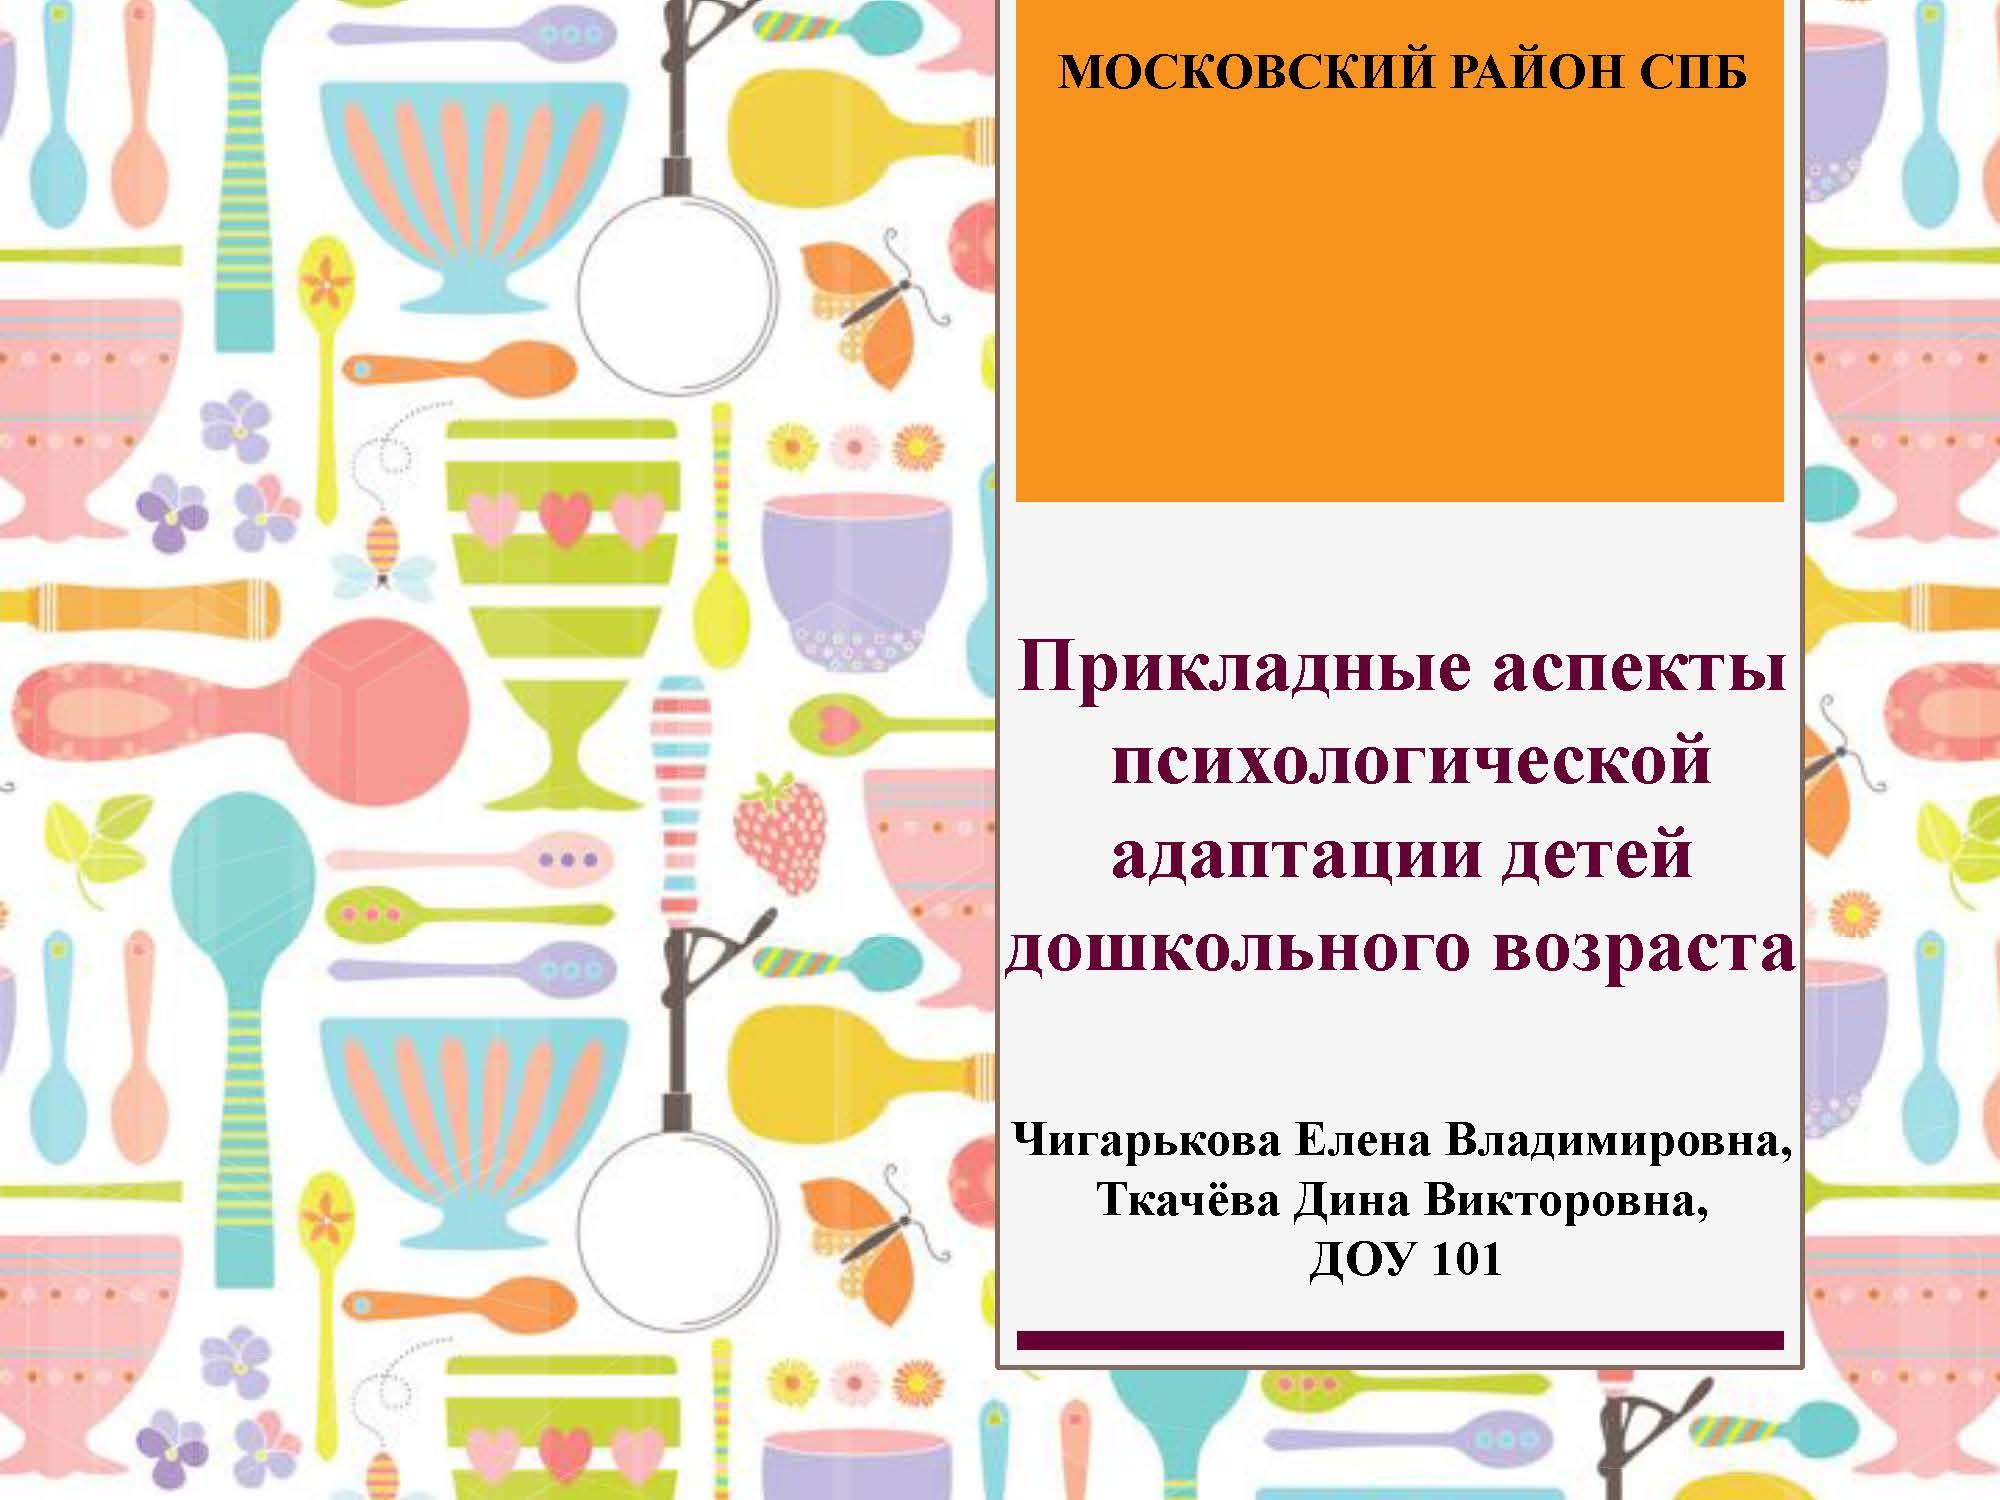 Секция 8. ДОУ 101, ПСИ. Московский район_Страница_01